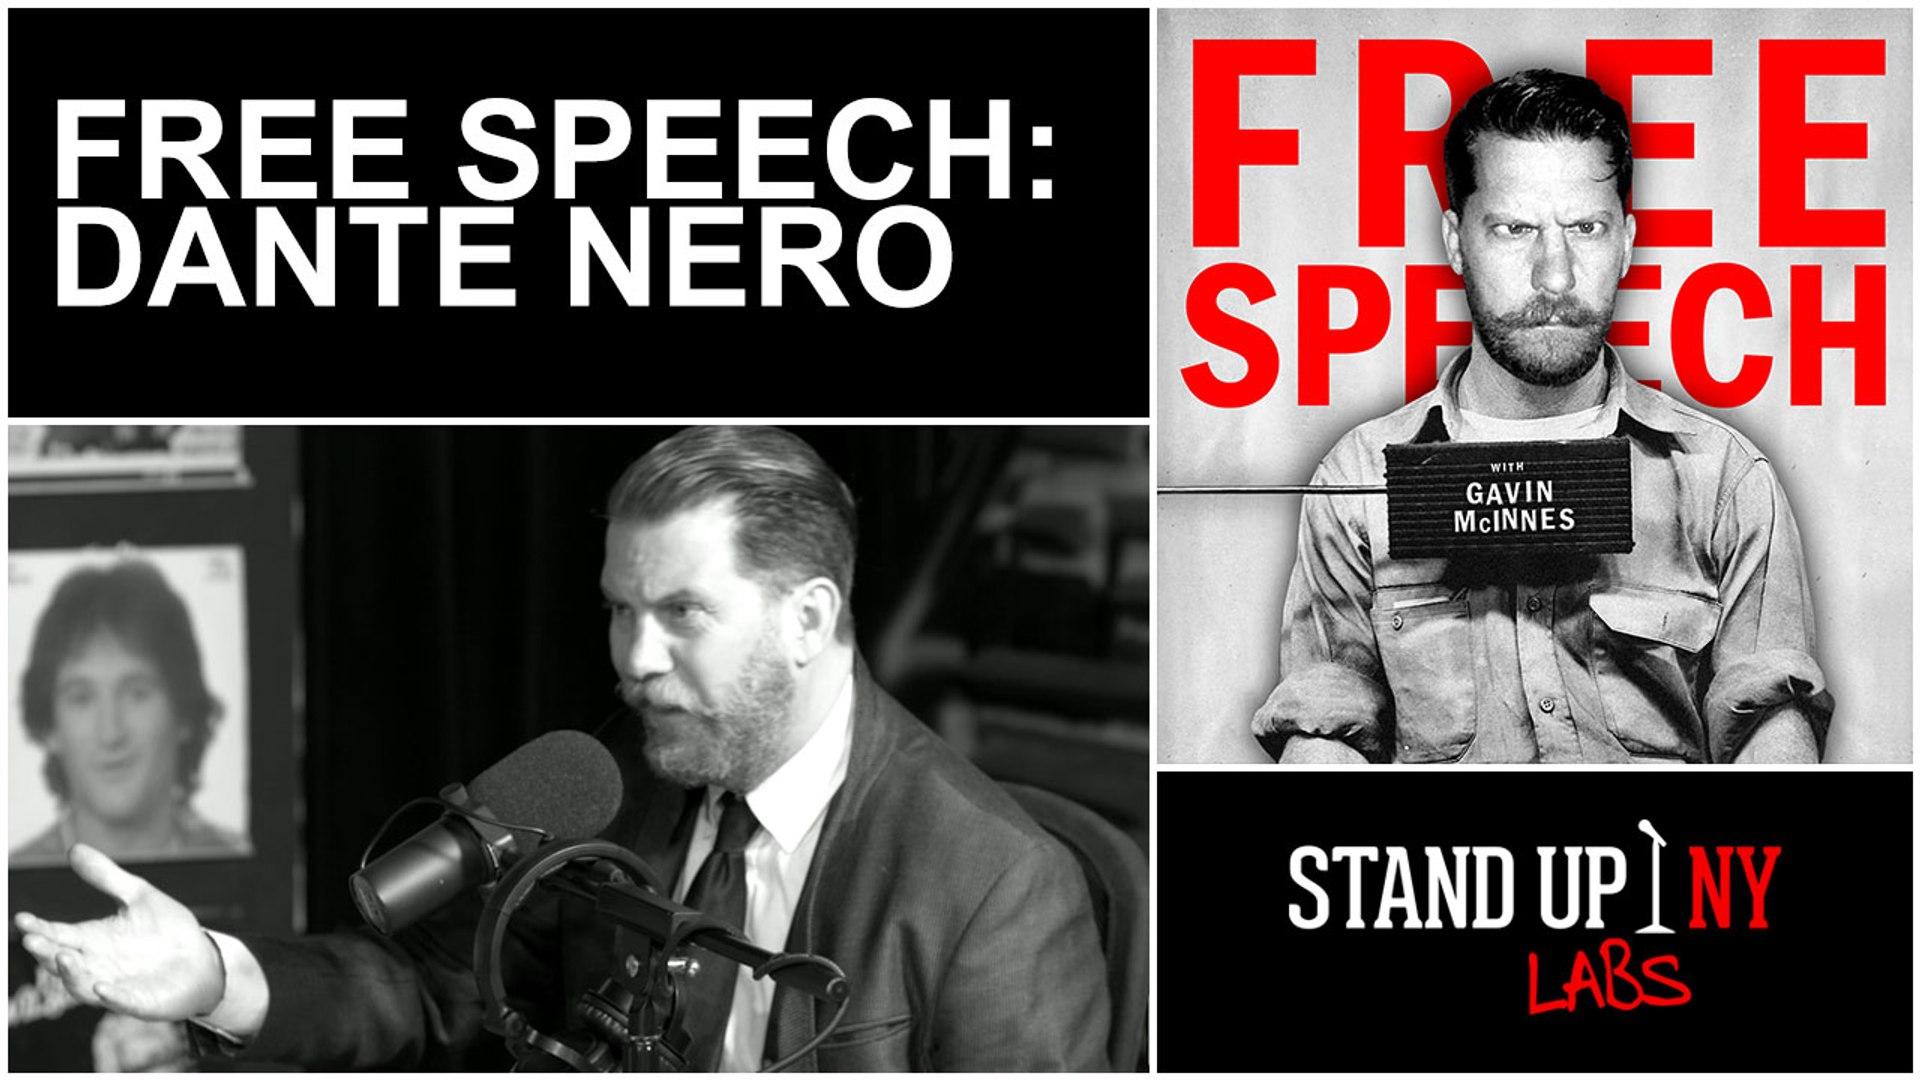 free speech dante nero